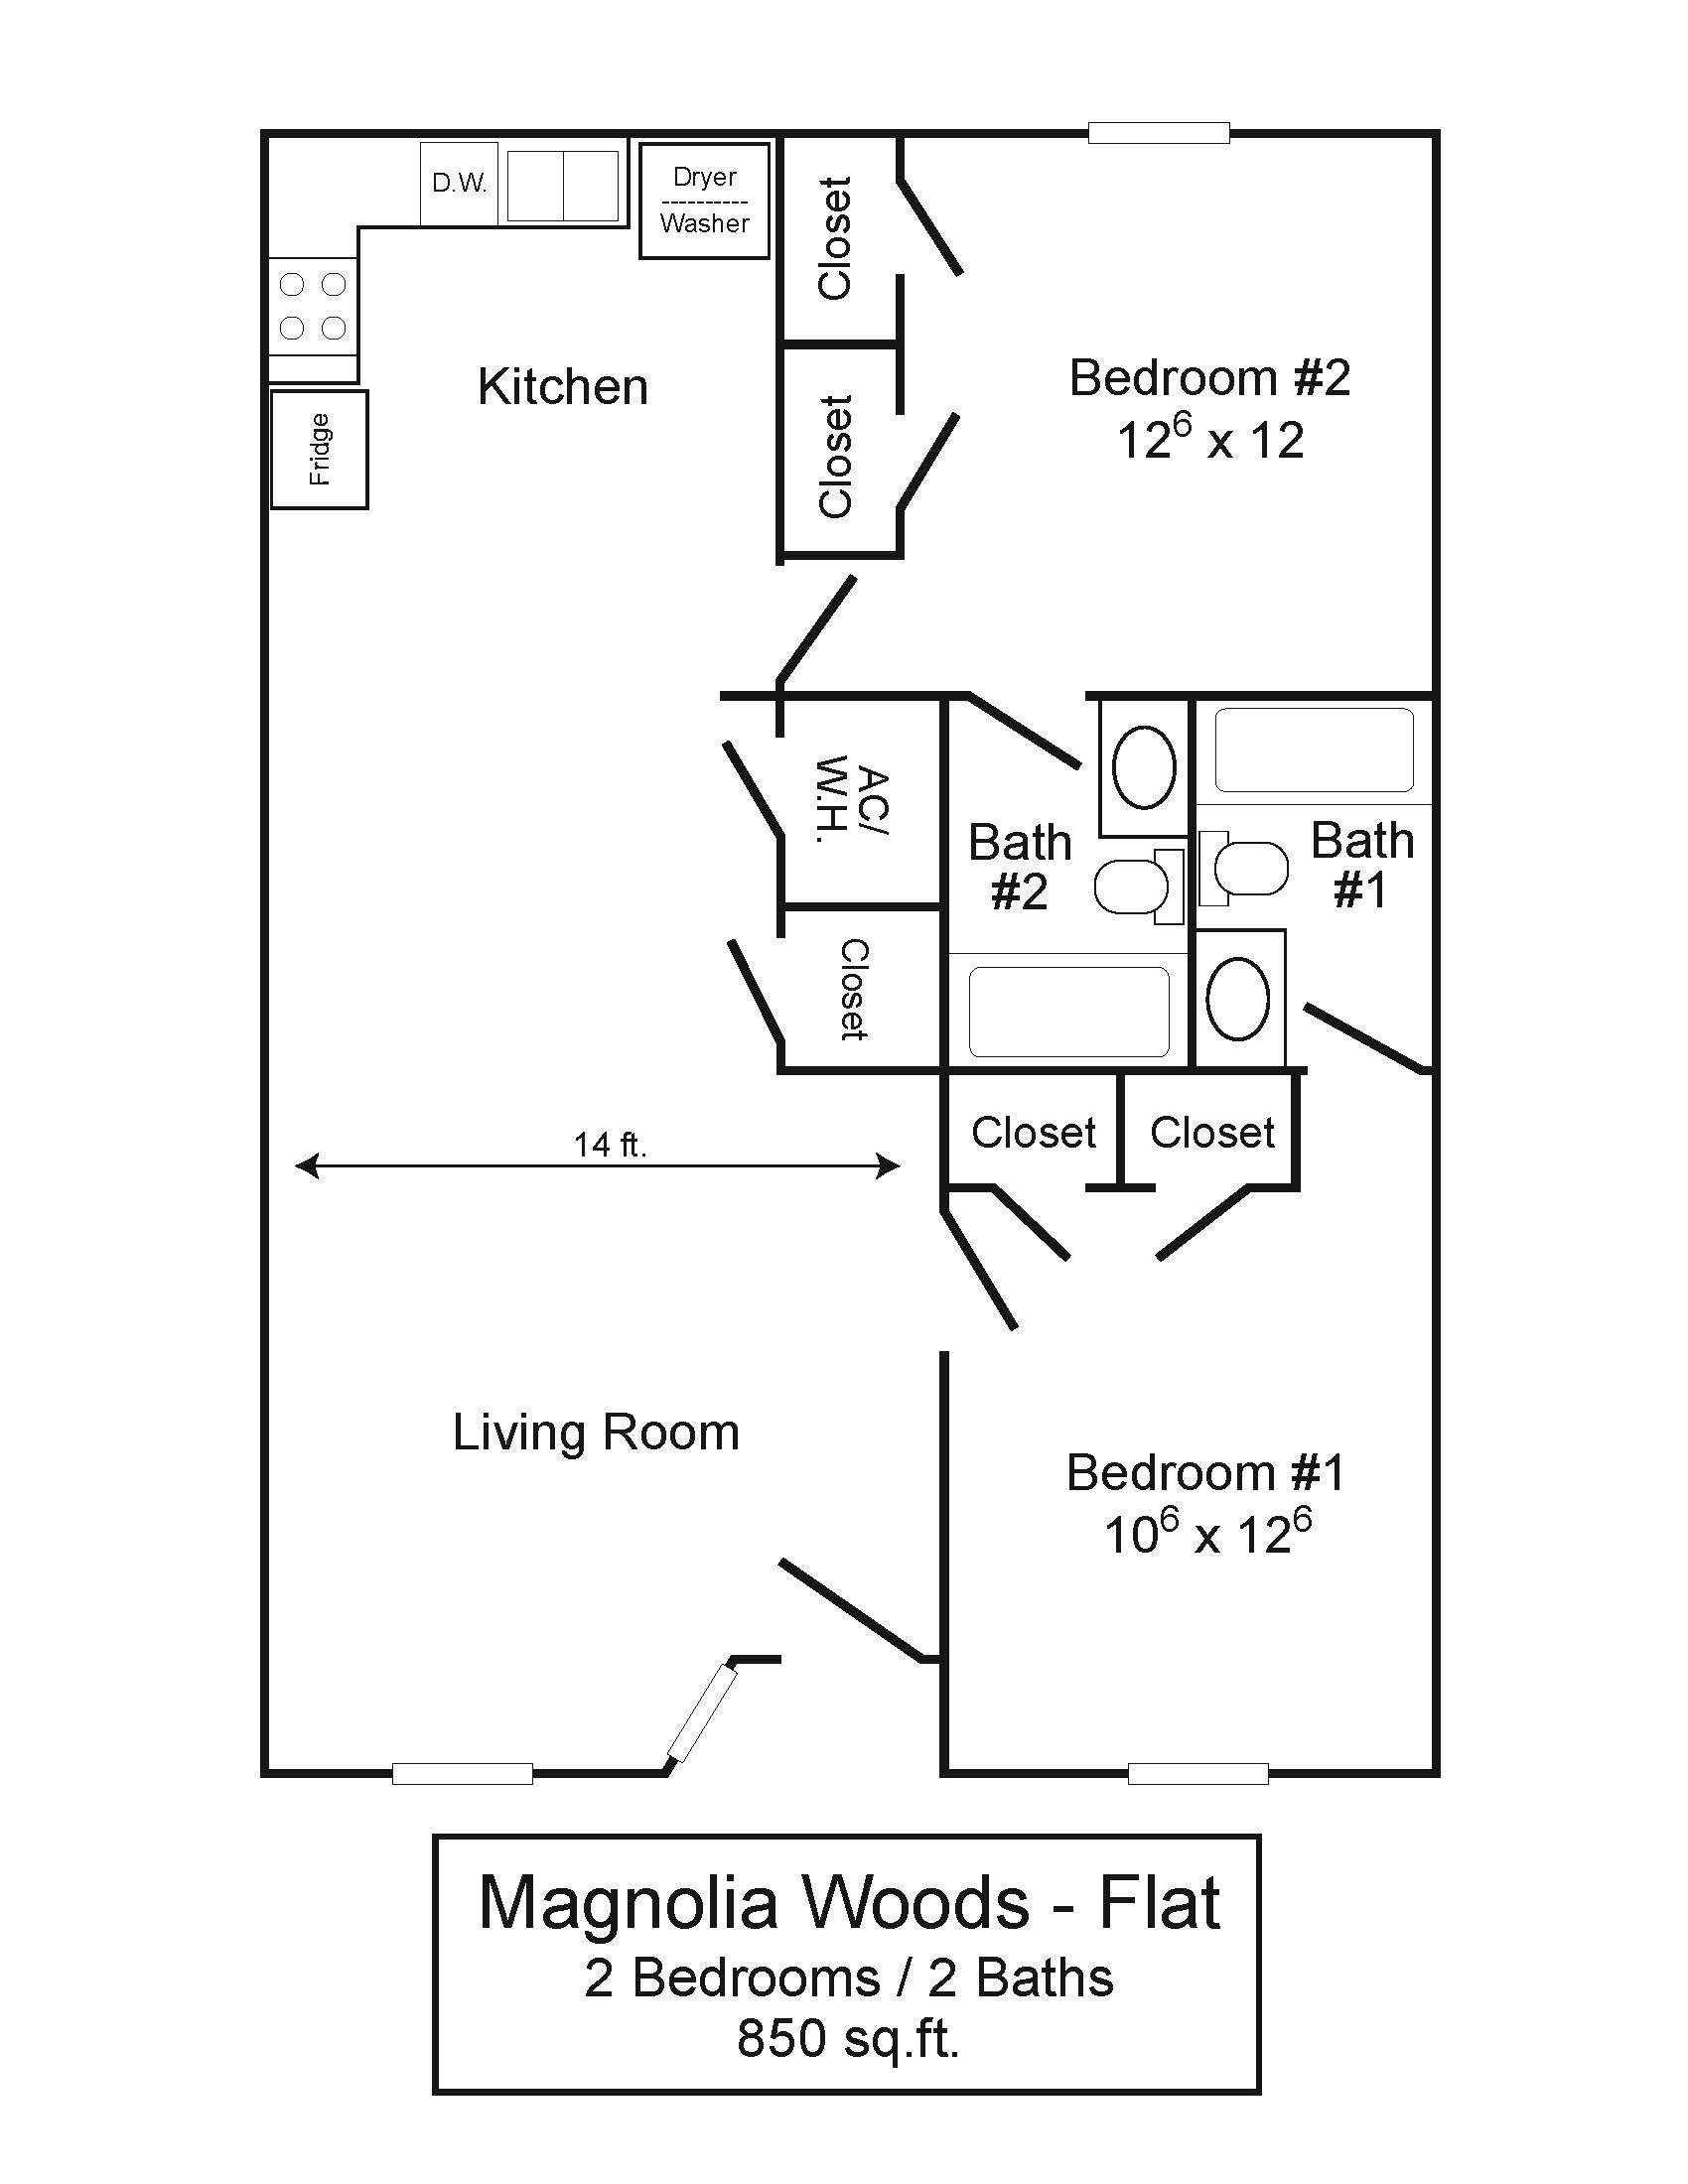 Magnolia Woods 2/2 Flat